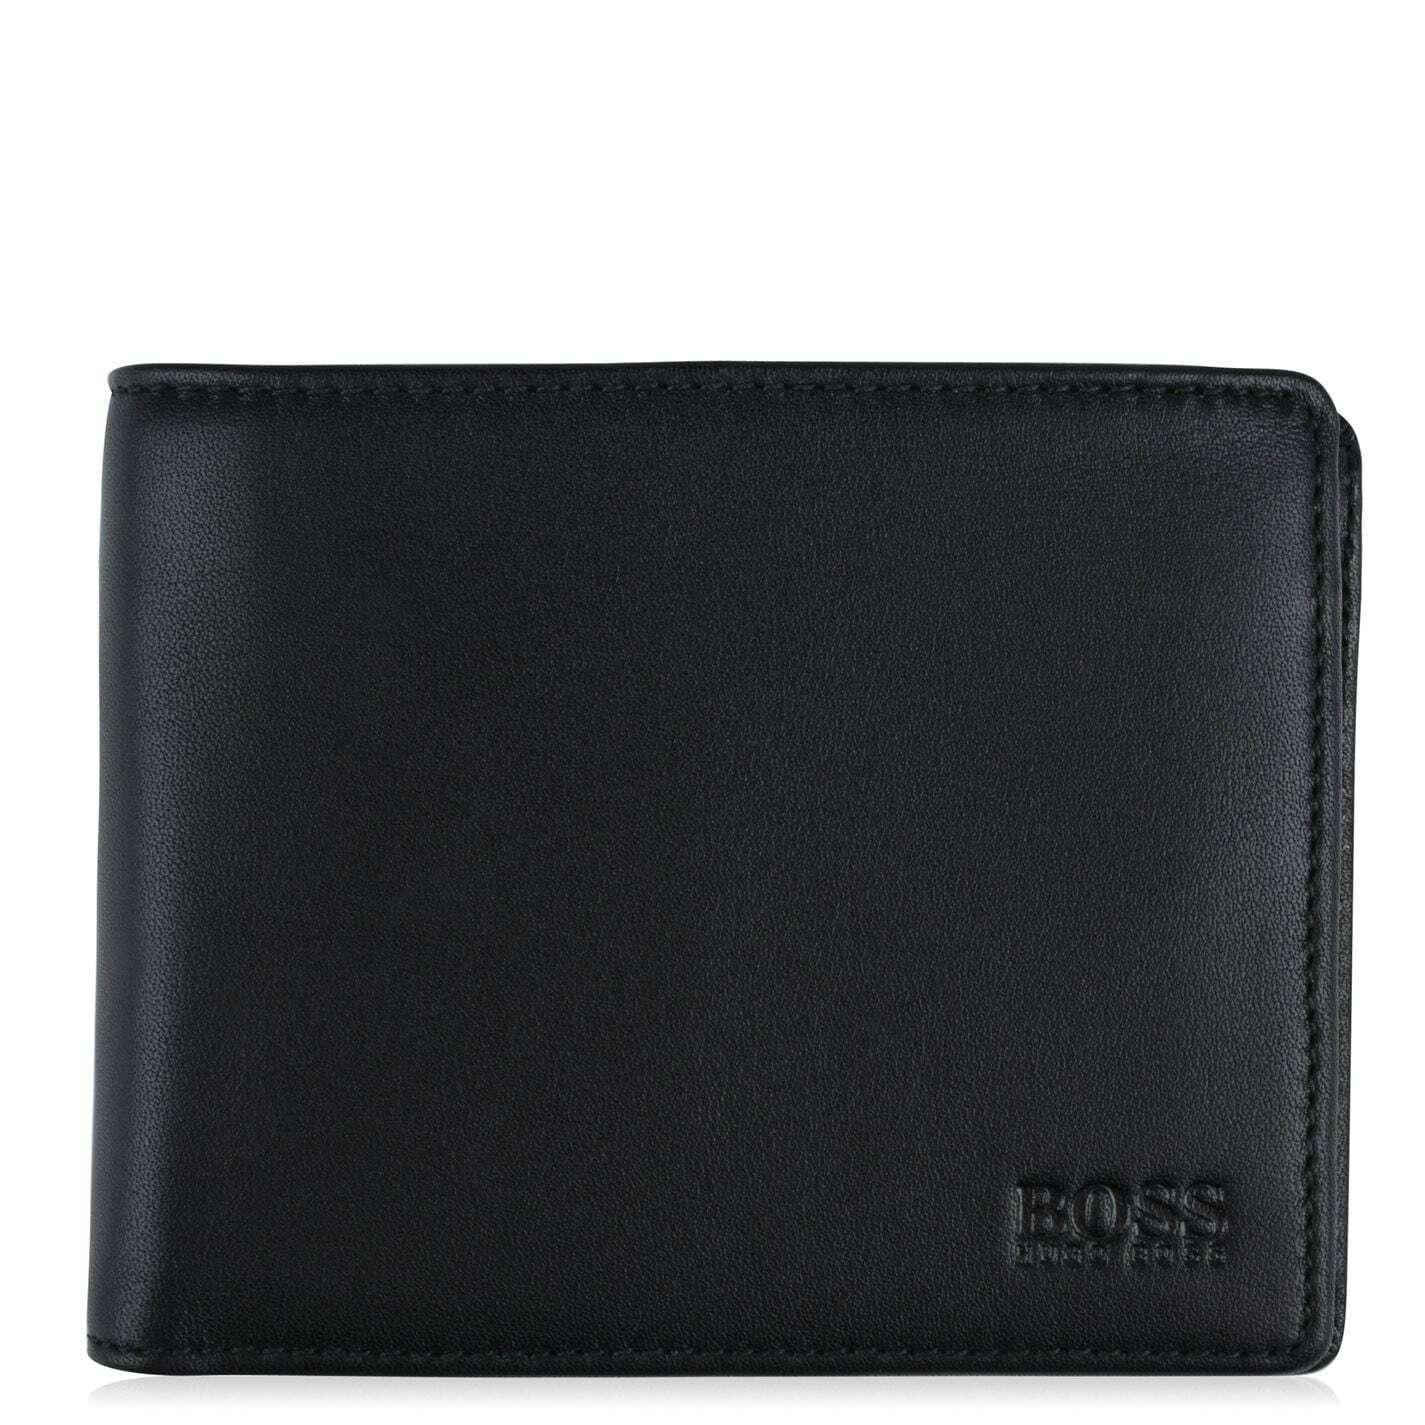 A-solo Hugo Boss Men Wallet 100% Leather Wallet Bifold,Coin & Card Holder Wallet